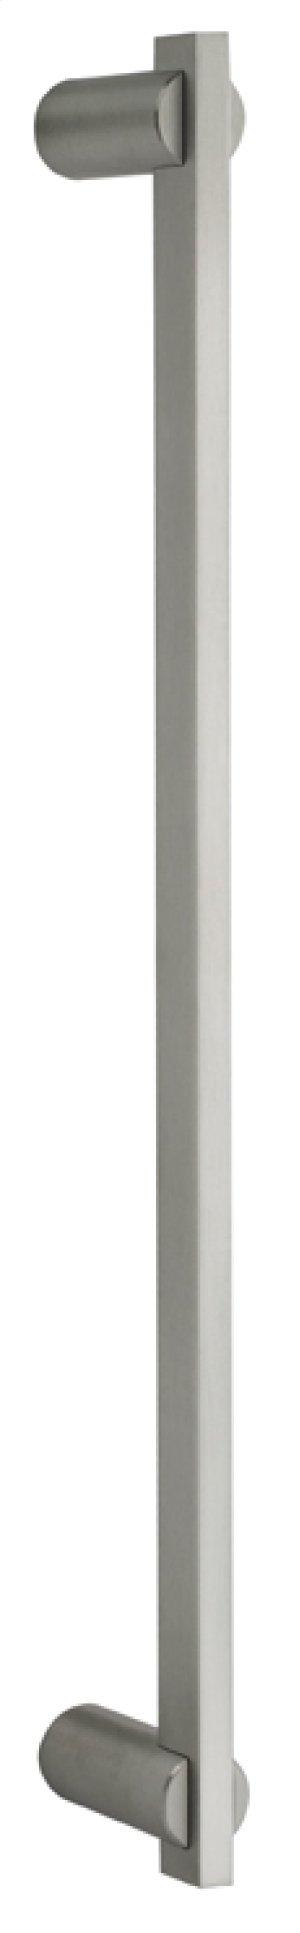 Modern Door Pull in (Modern Door Pull - Solid Stainless Steel) Product Image